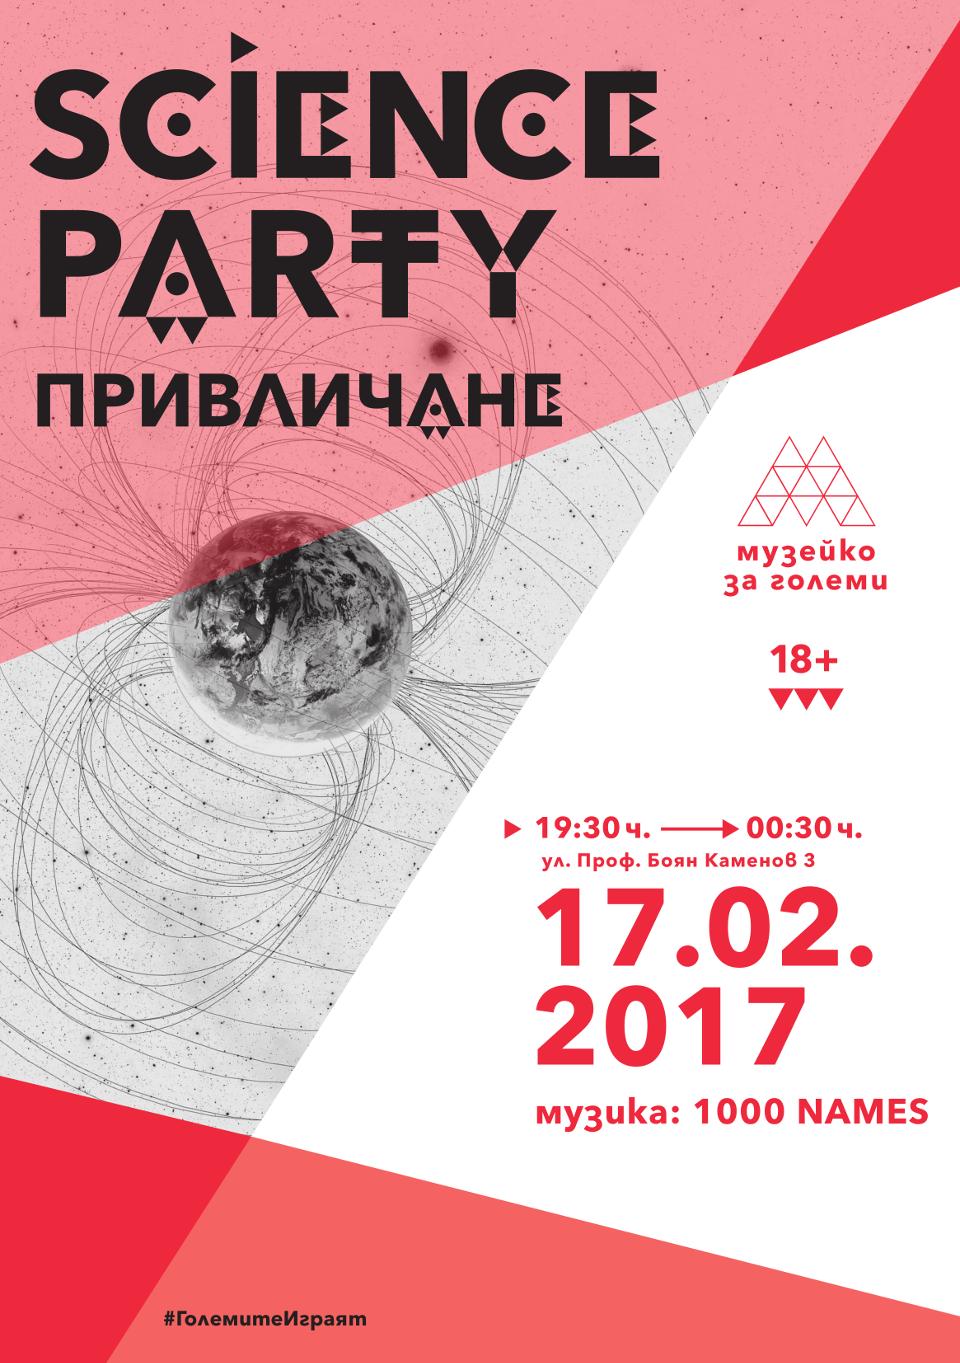 muzeiko-science-party-privlichane-17-02-2017-poster